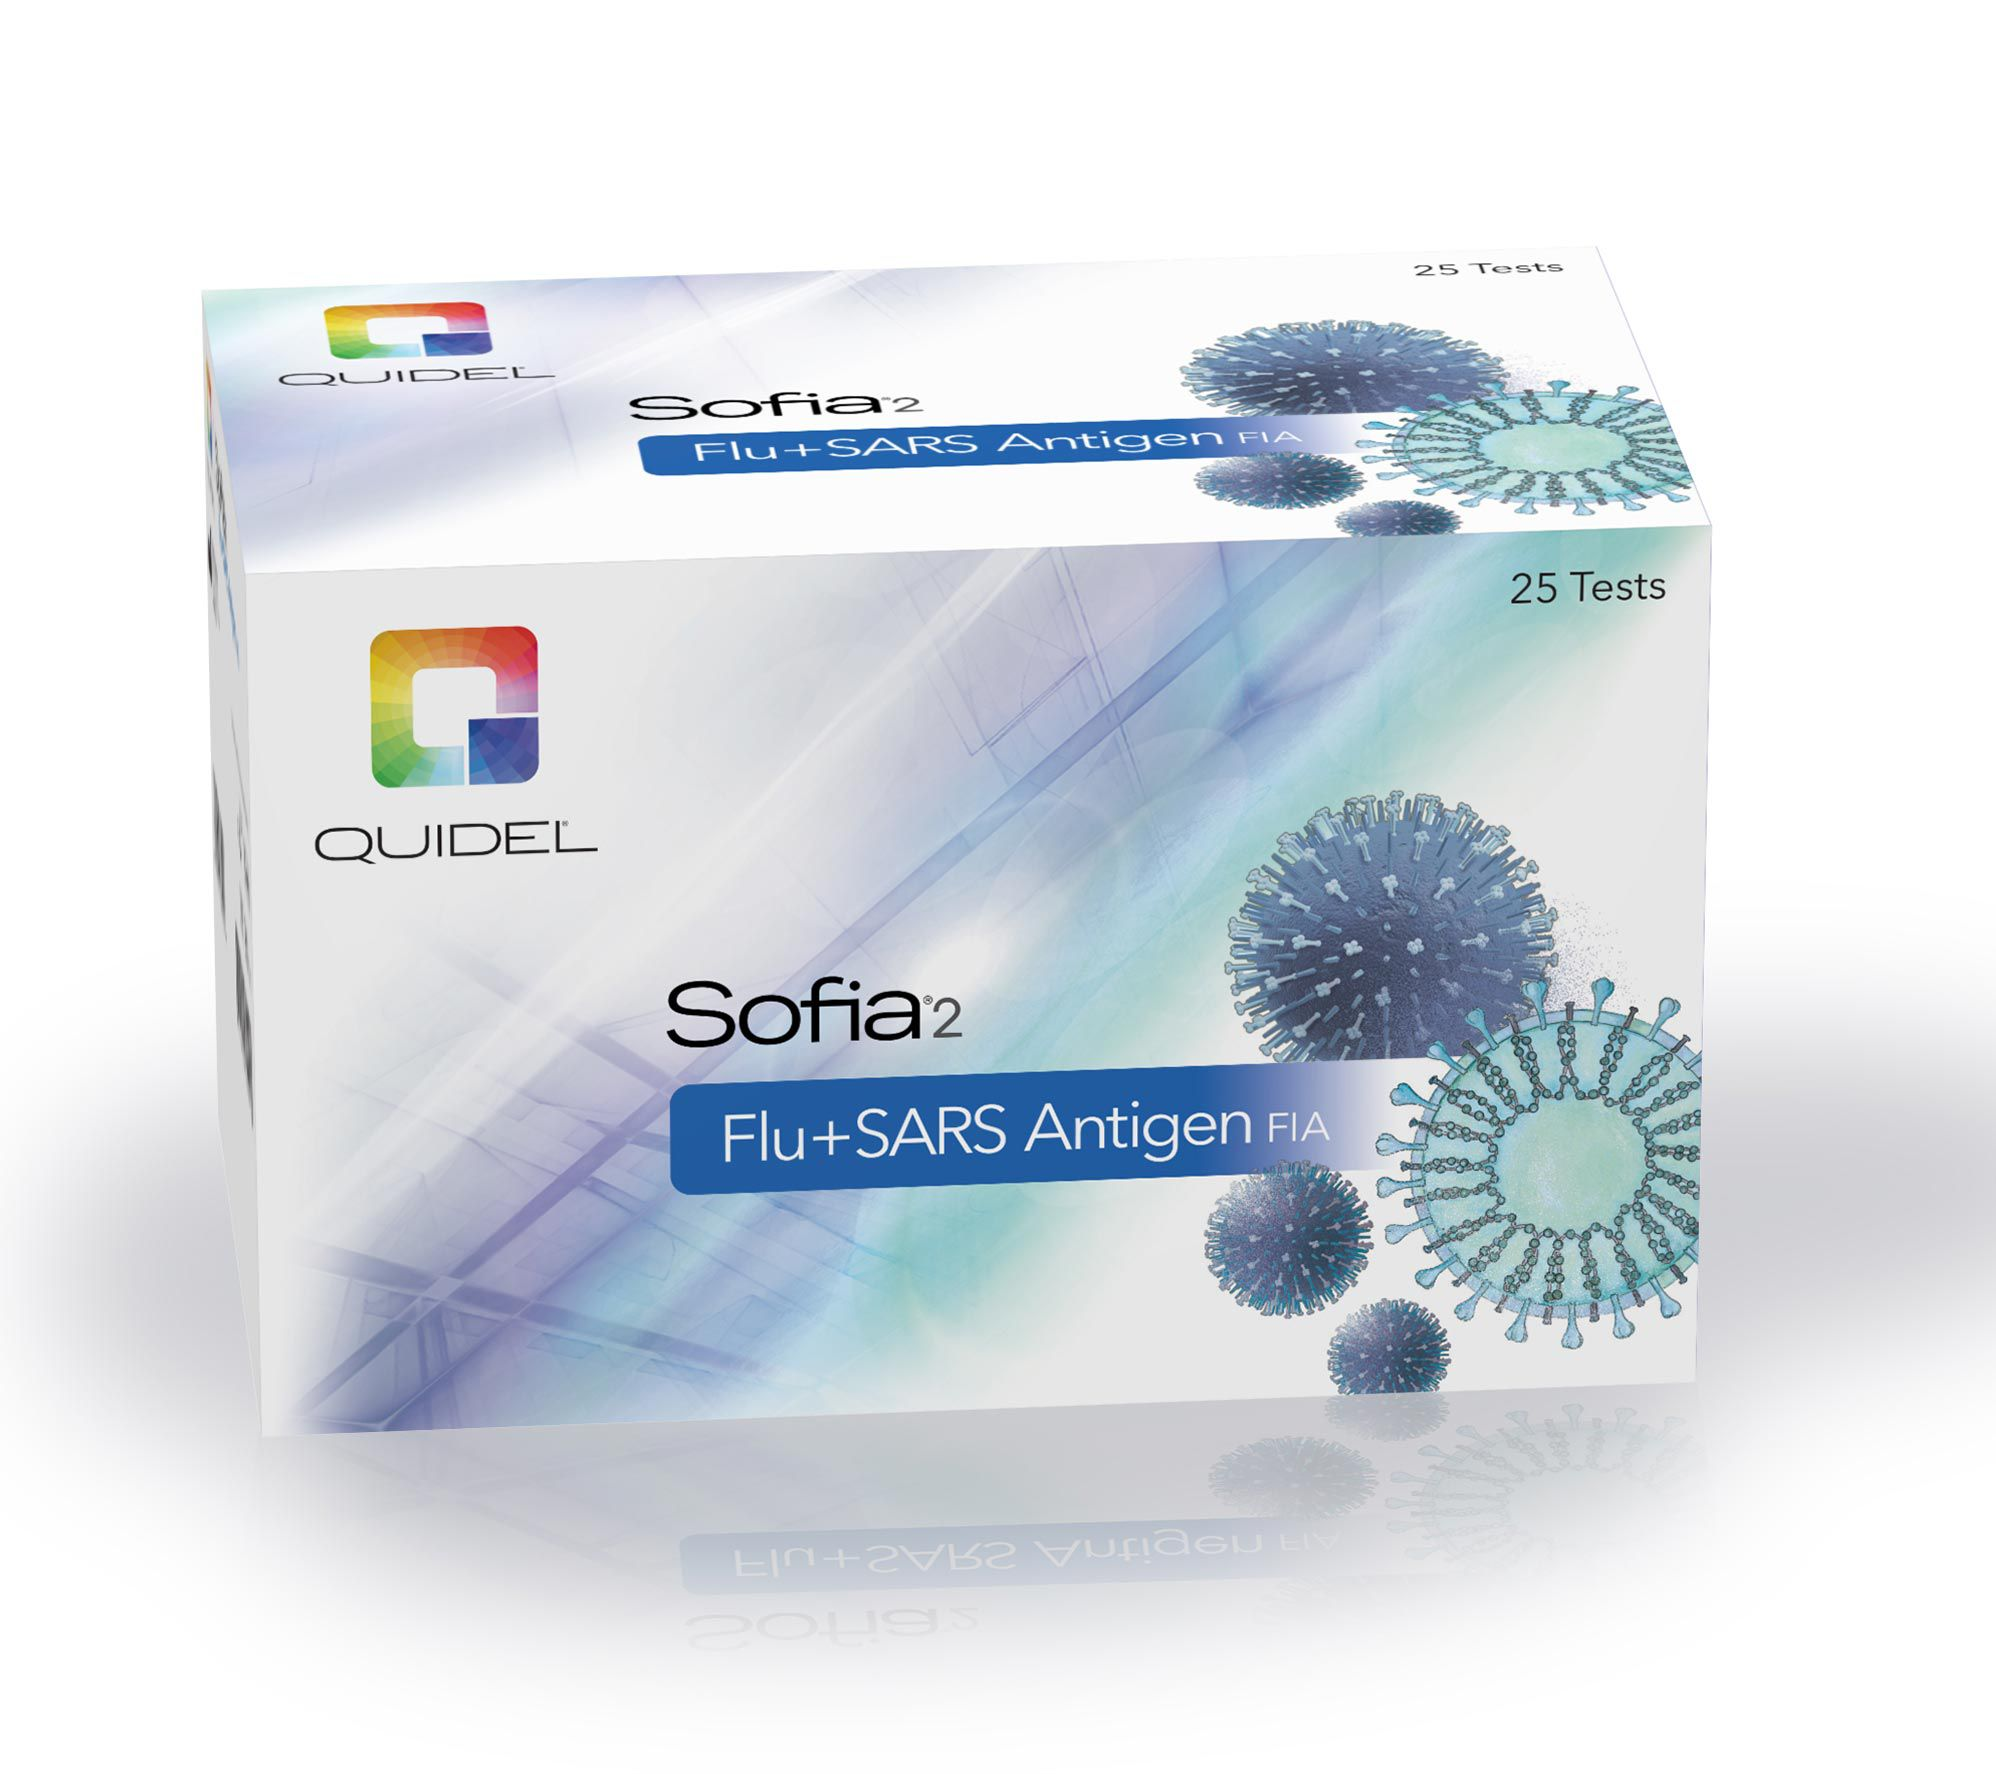 Sofia® 2 Flu + SARS Antigen FIA